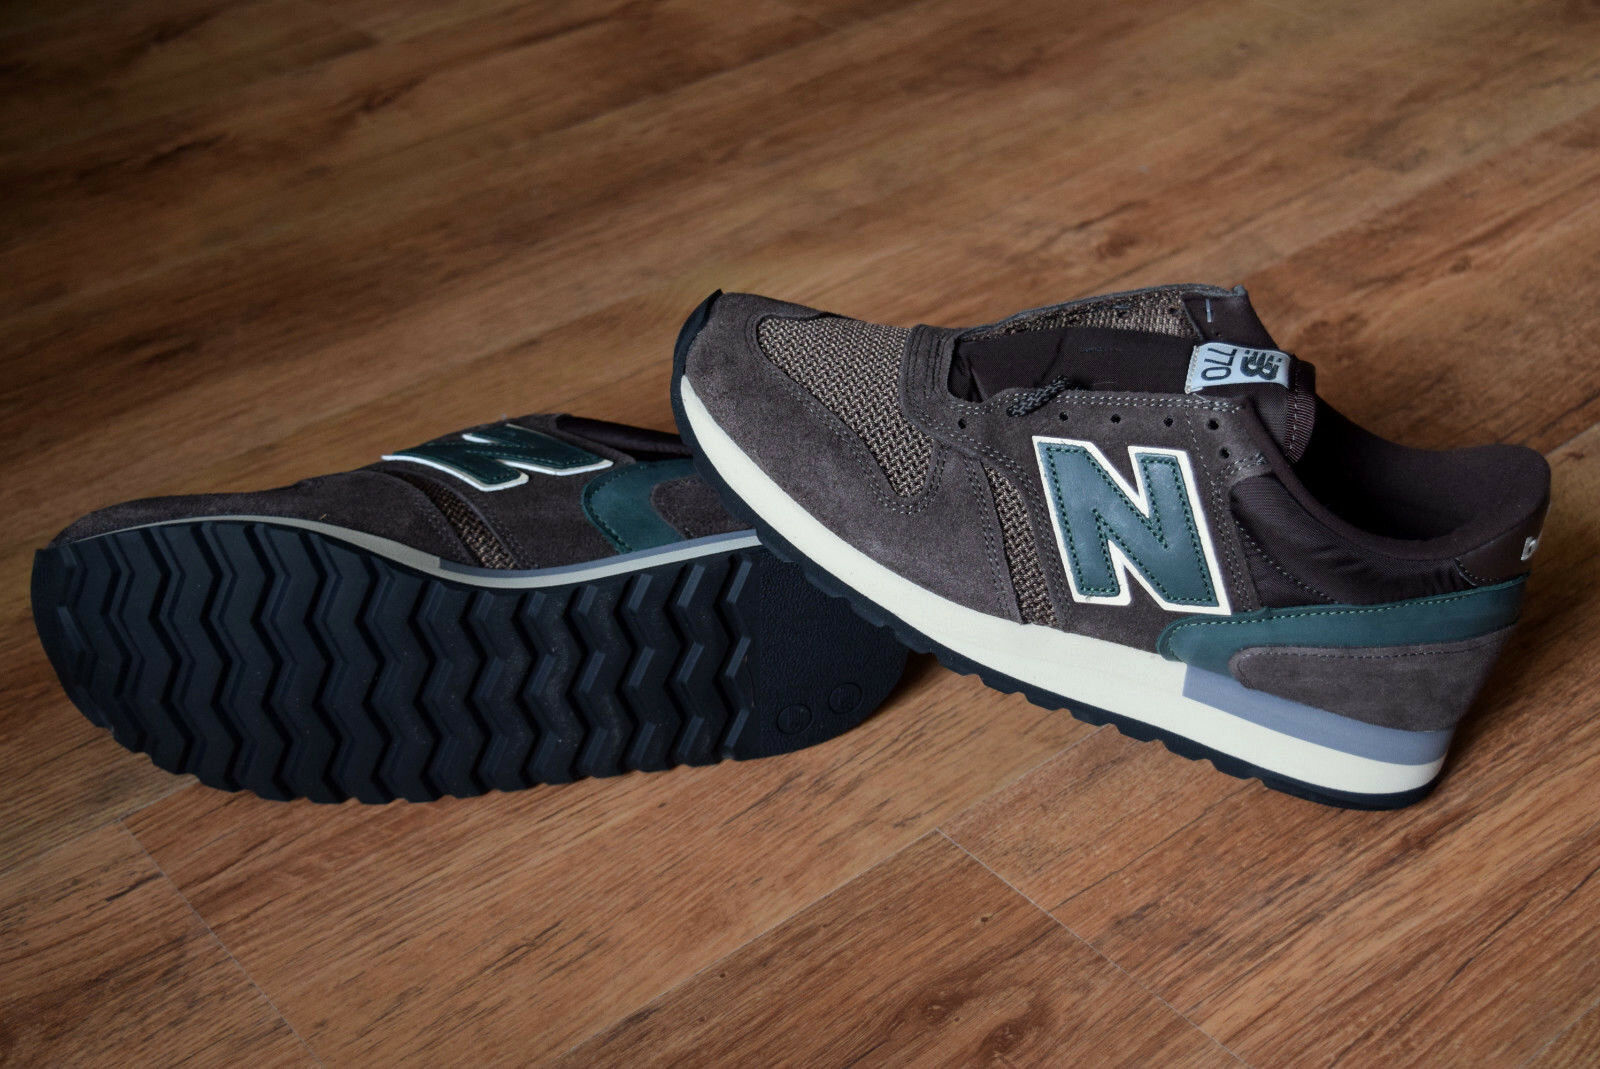 New Balance M 770 AET 40 41 41 41 42 42,5 43 44 45 46 made in England UK Classic 576 3e070e